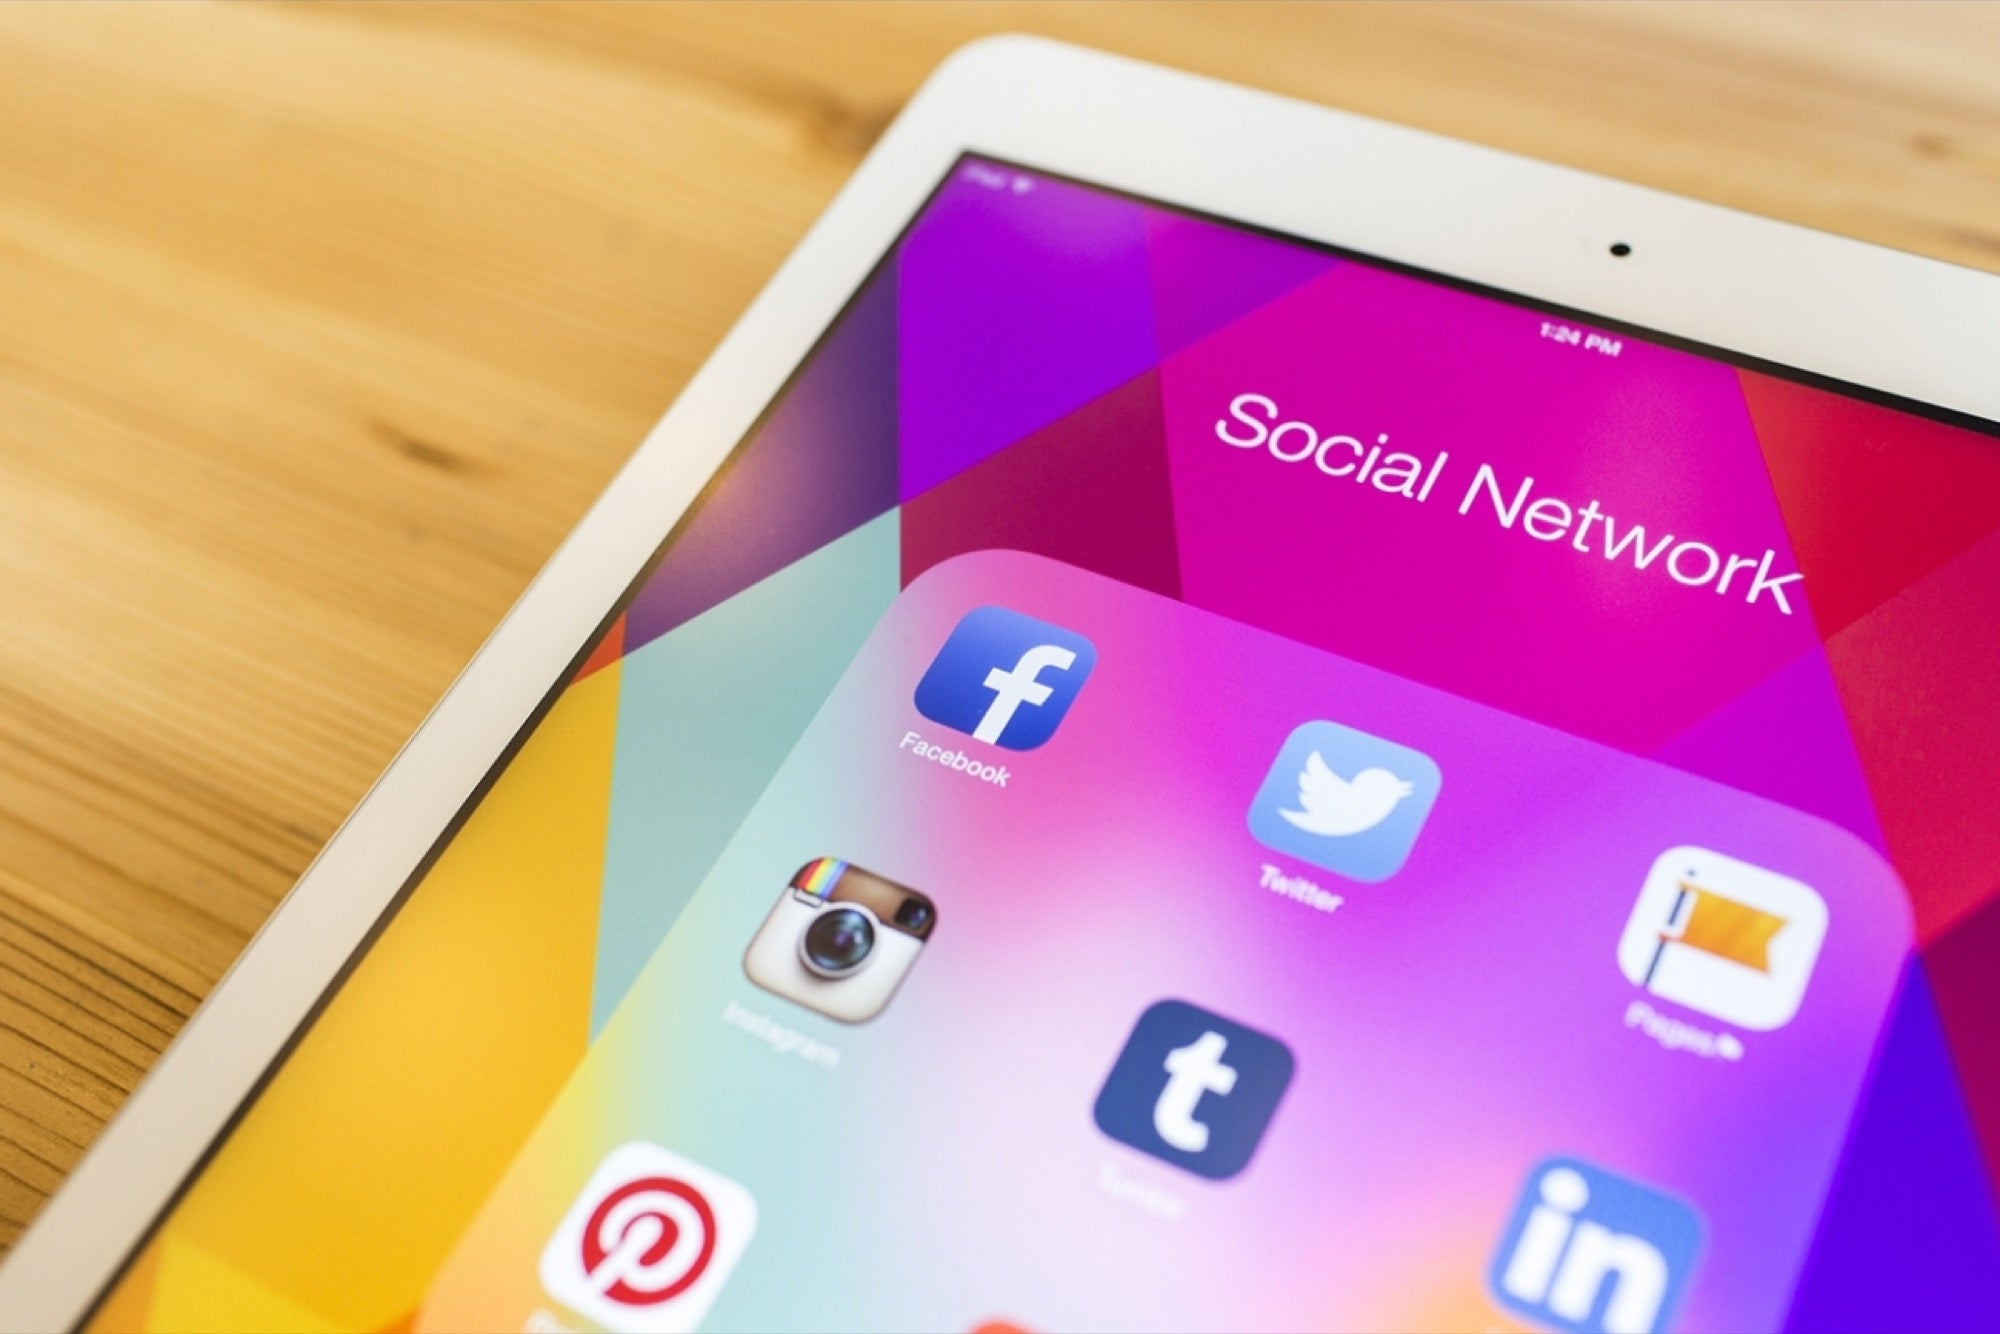 entrepreneur.com - Mazhar Nadiadwala - Importance of Social Media & Marketing in the Events Industry